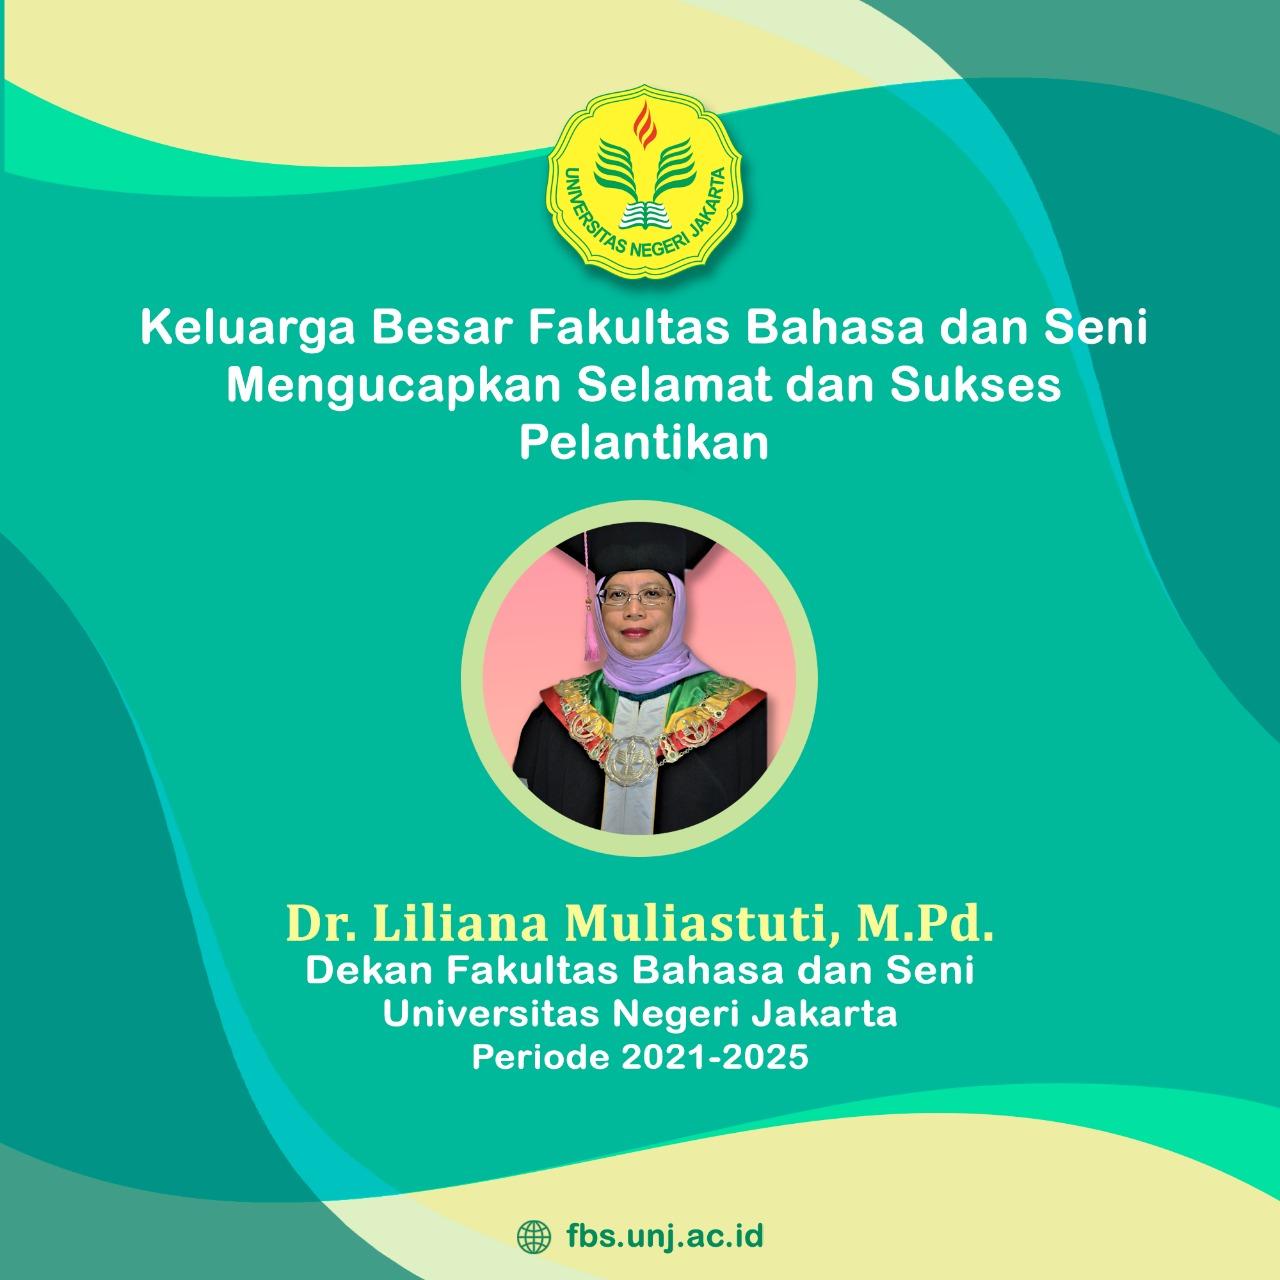 Pelantikan Dekan Fakultas Bahasa dan Seni Periode 2021-2025: Kilas Balik Pemilihan Calon Dekan Fakultas Bahasa dan Seni.